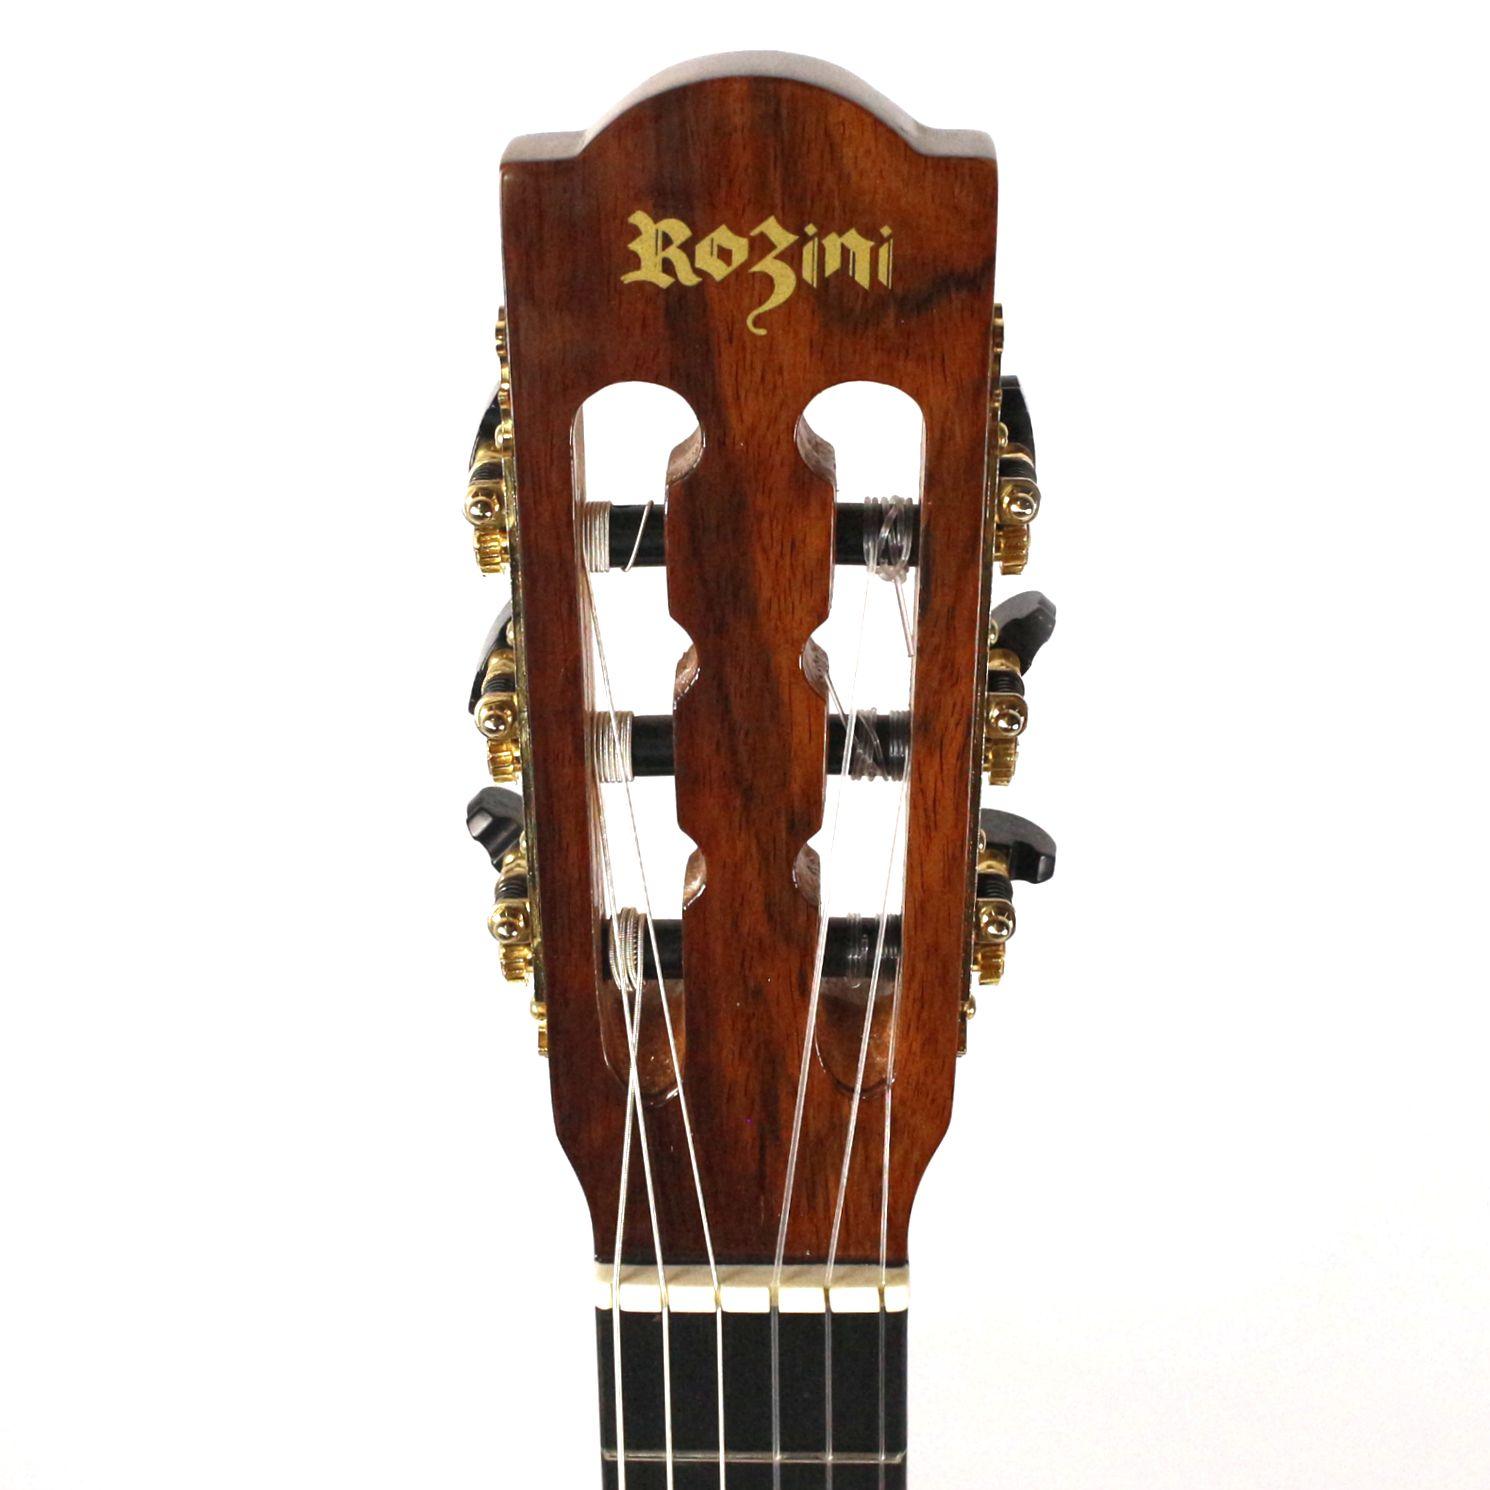 Violão Clássico NYLON Rozini Profissional Acustico em Jacarandá RX213.AC.N.J Pestana 52 MM